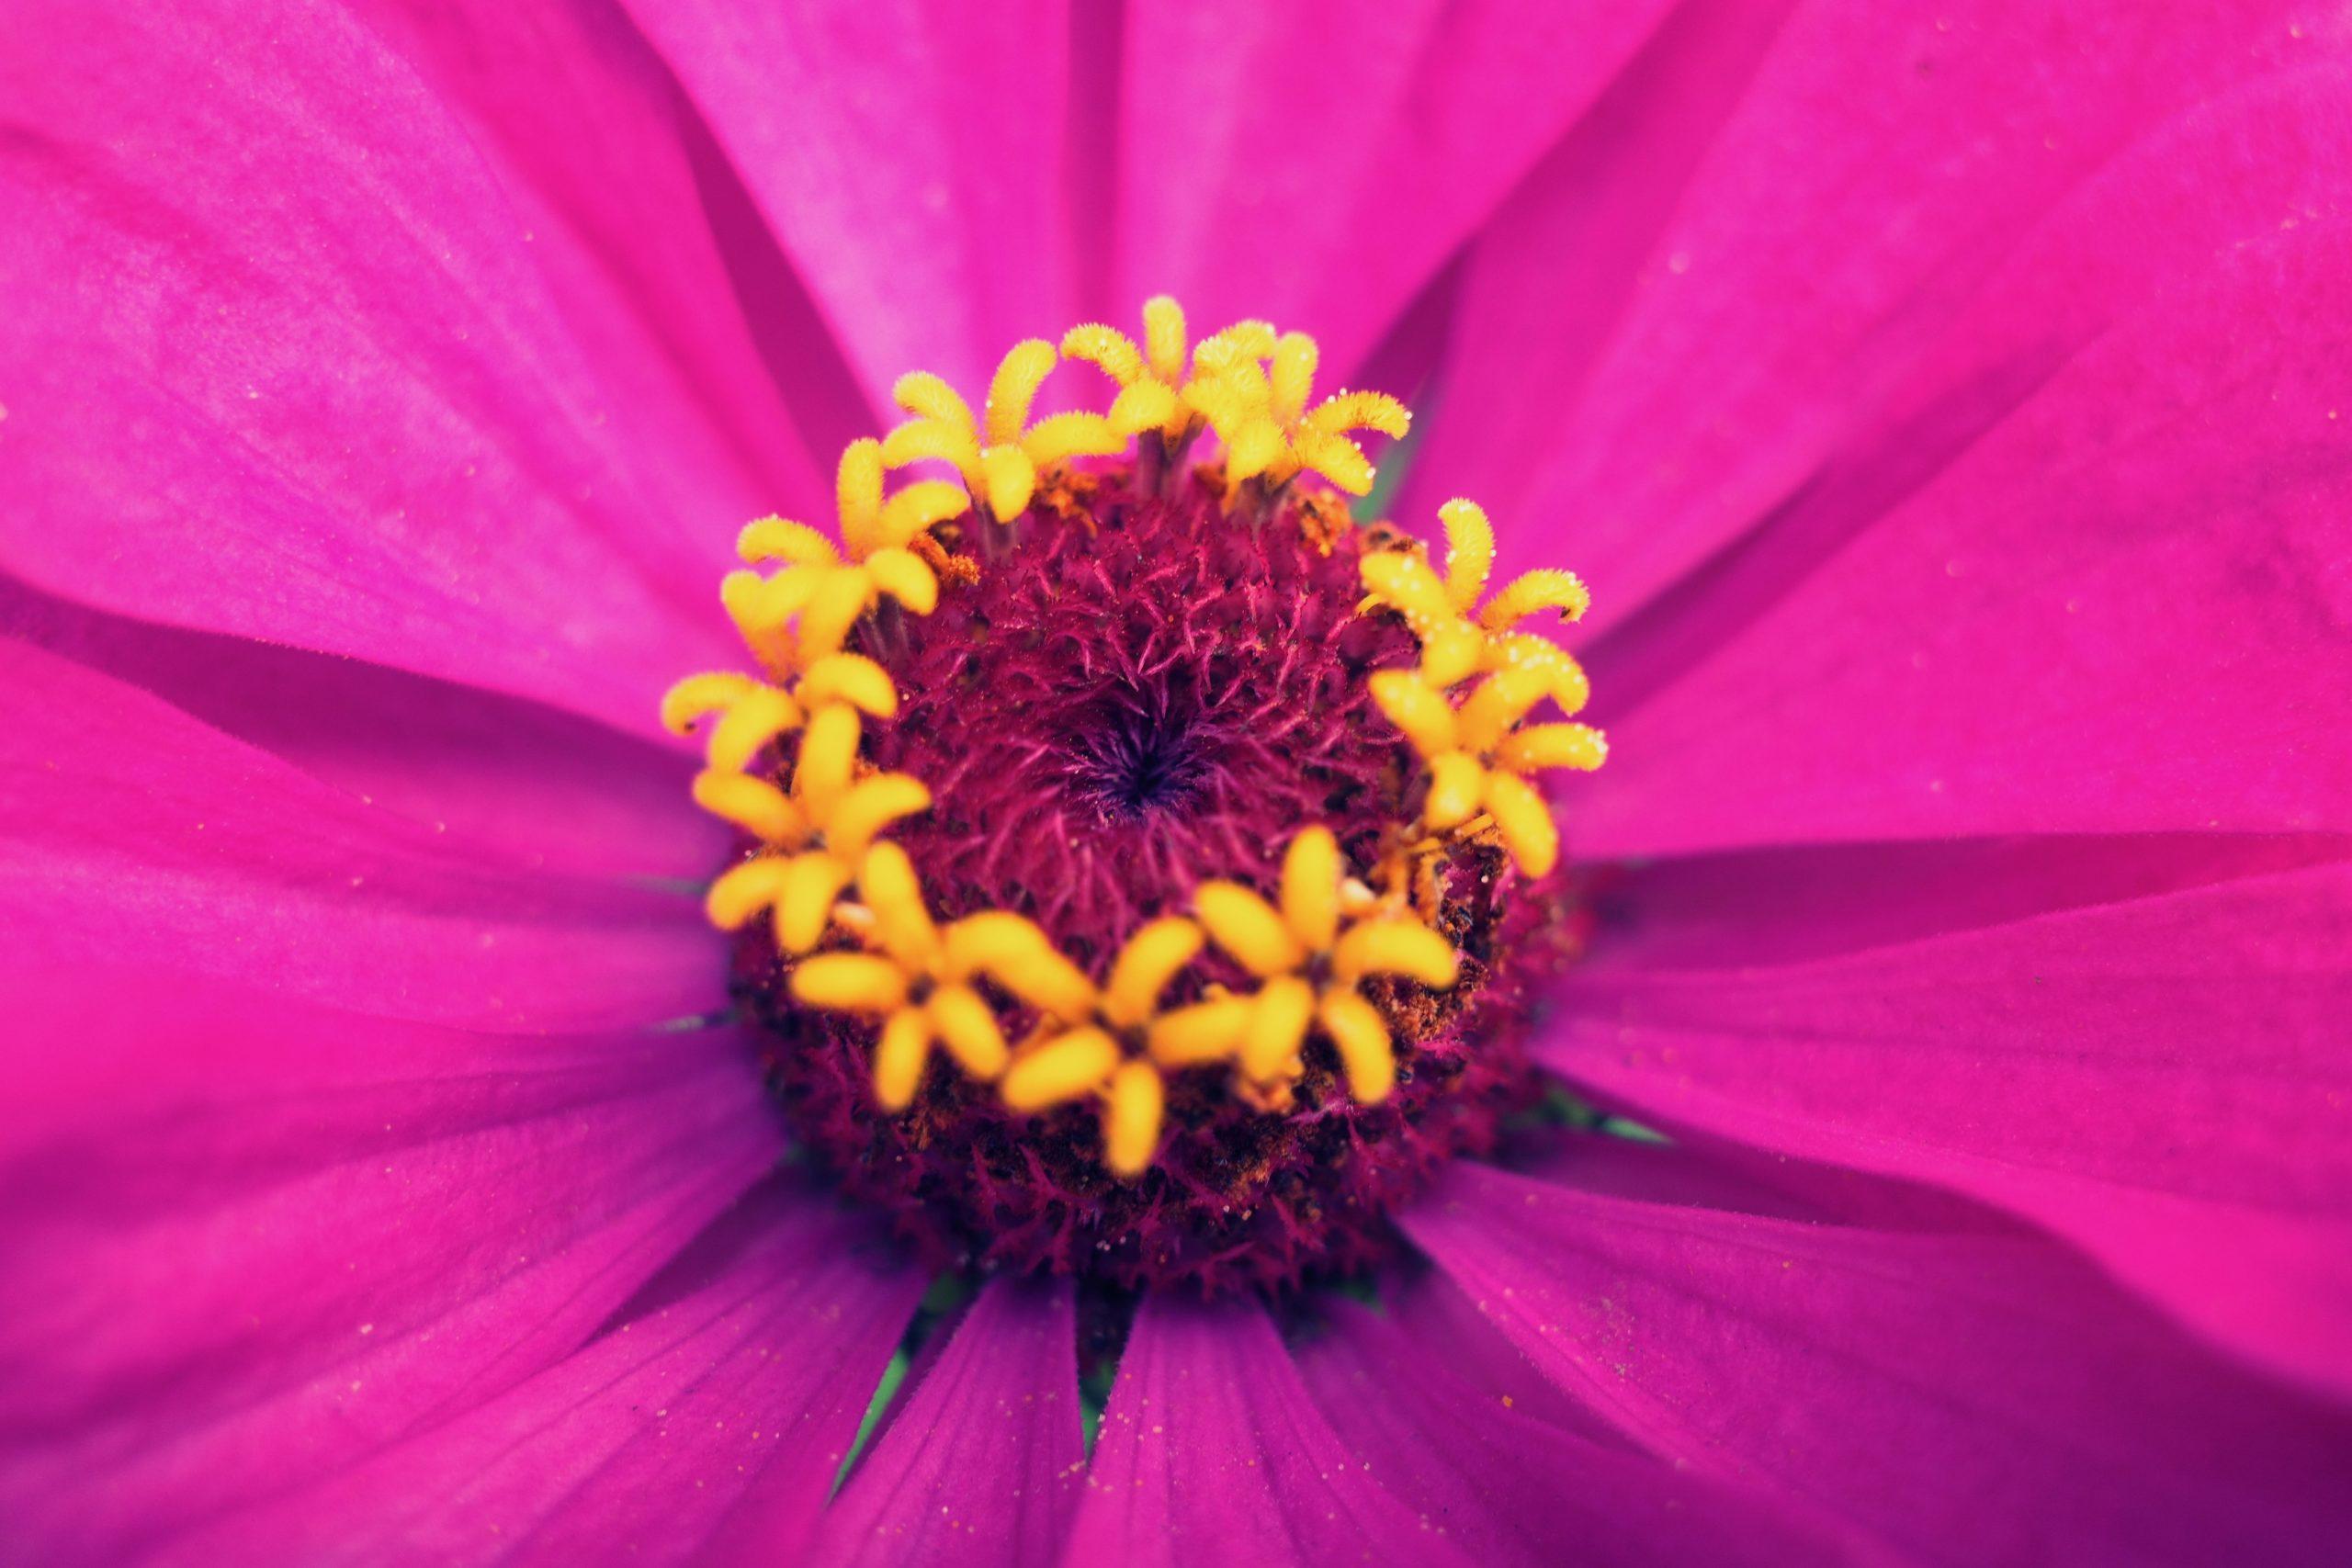 flower macro Ricoh gr iii